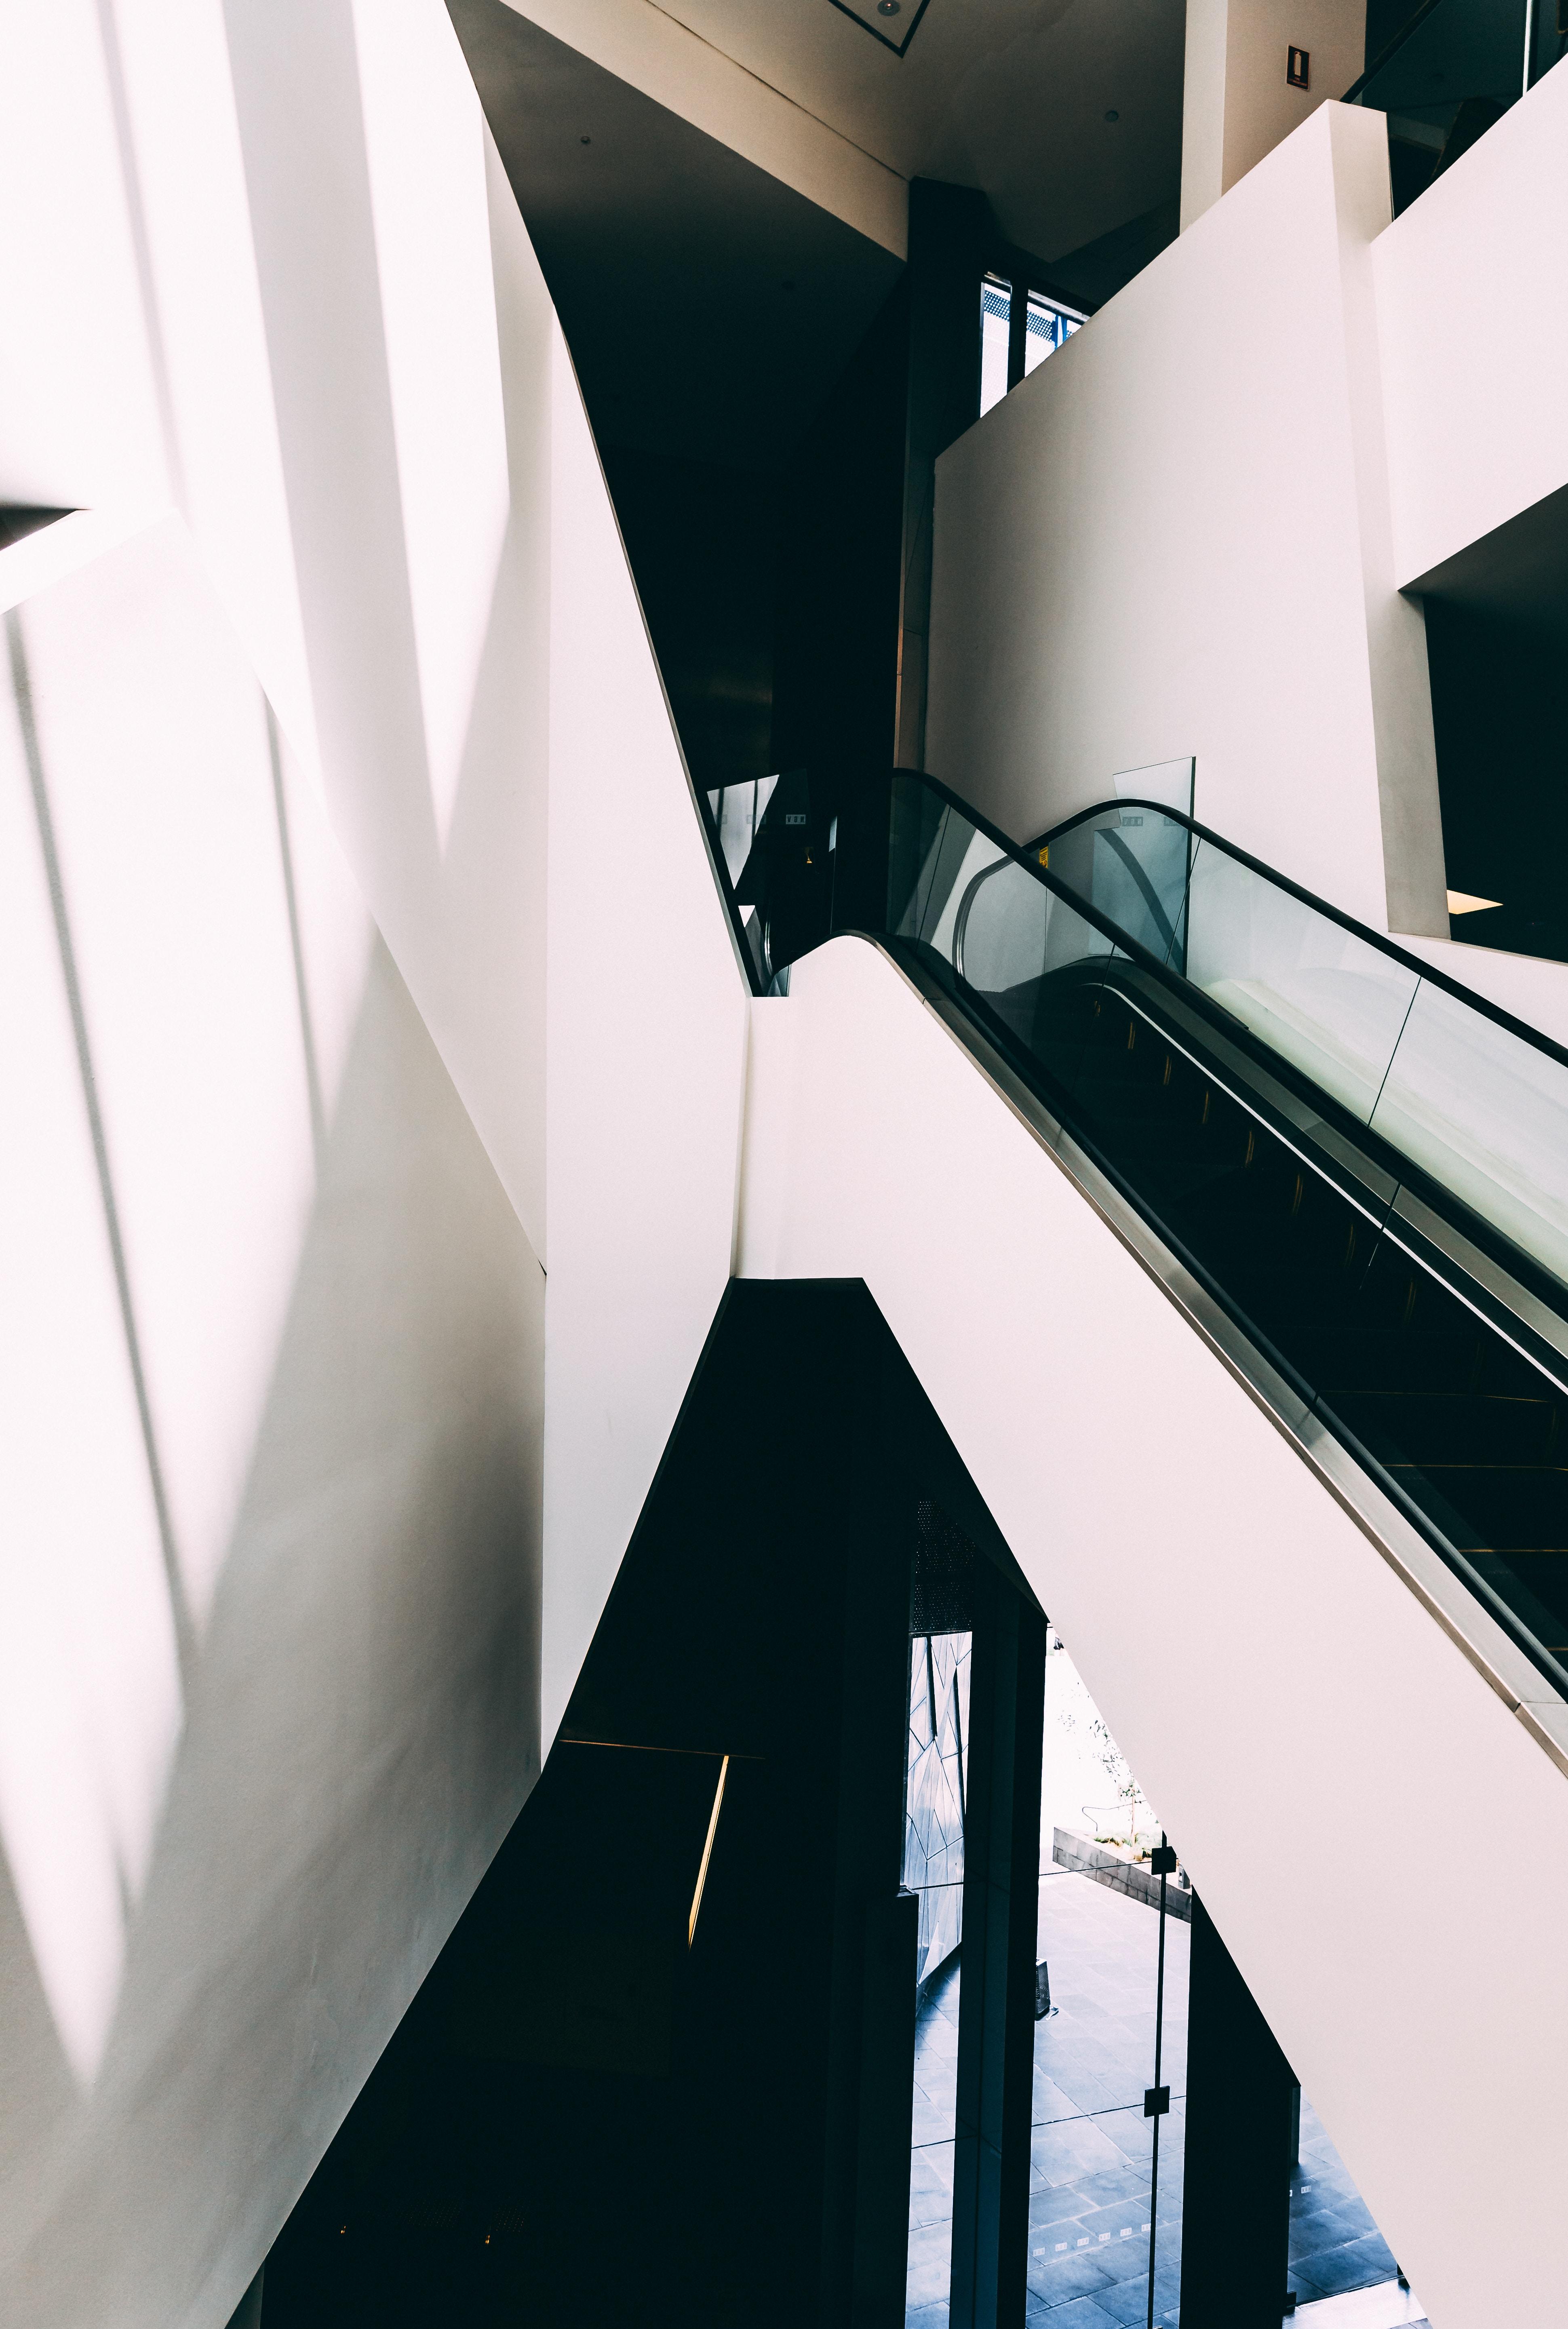 white and black escalator inside building